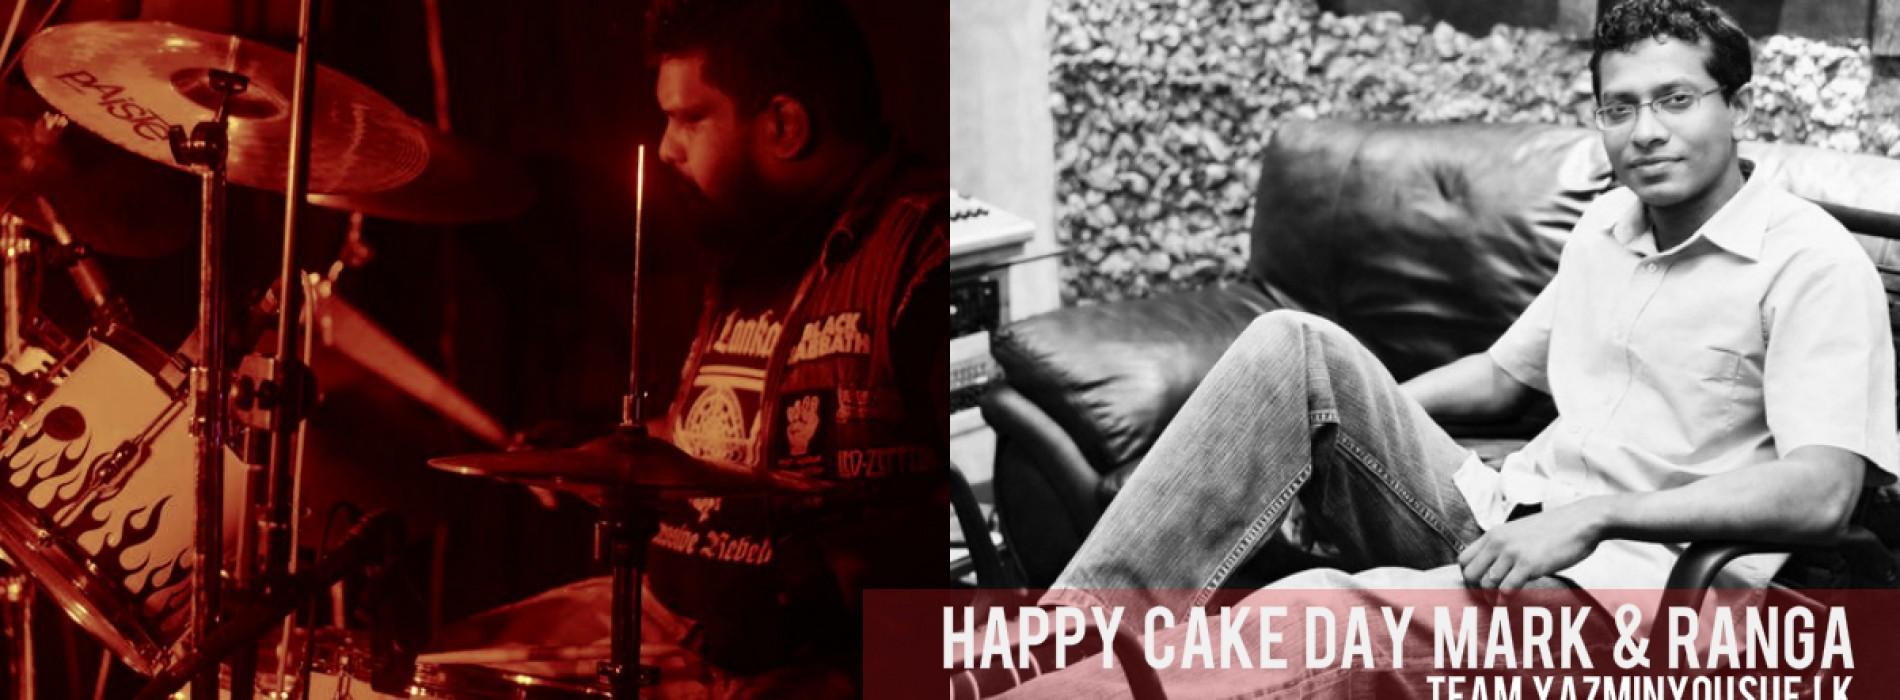 Happy Cake Day To Mark & Ranga